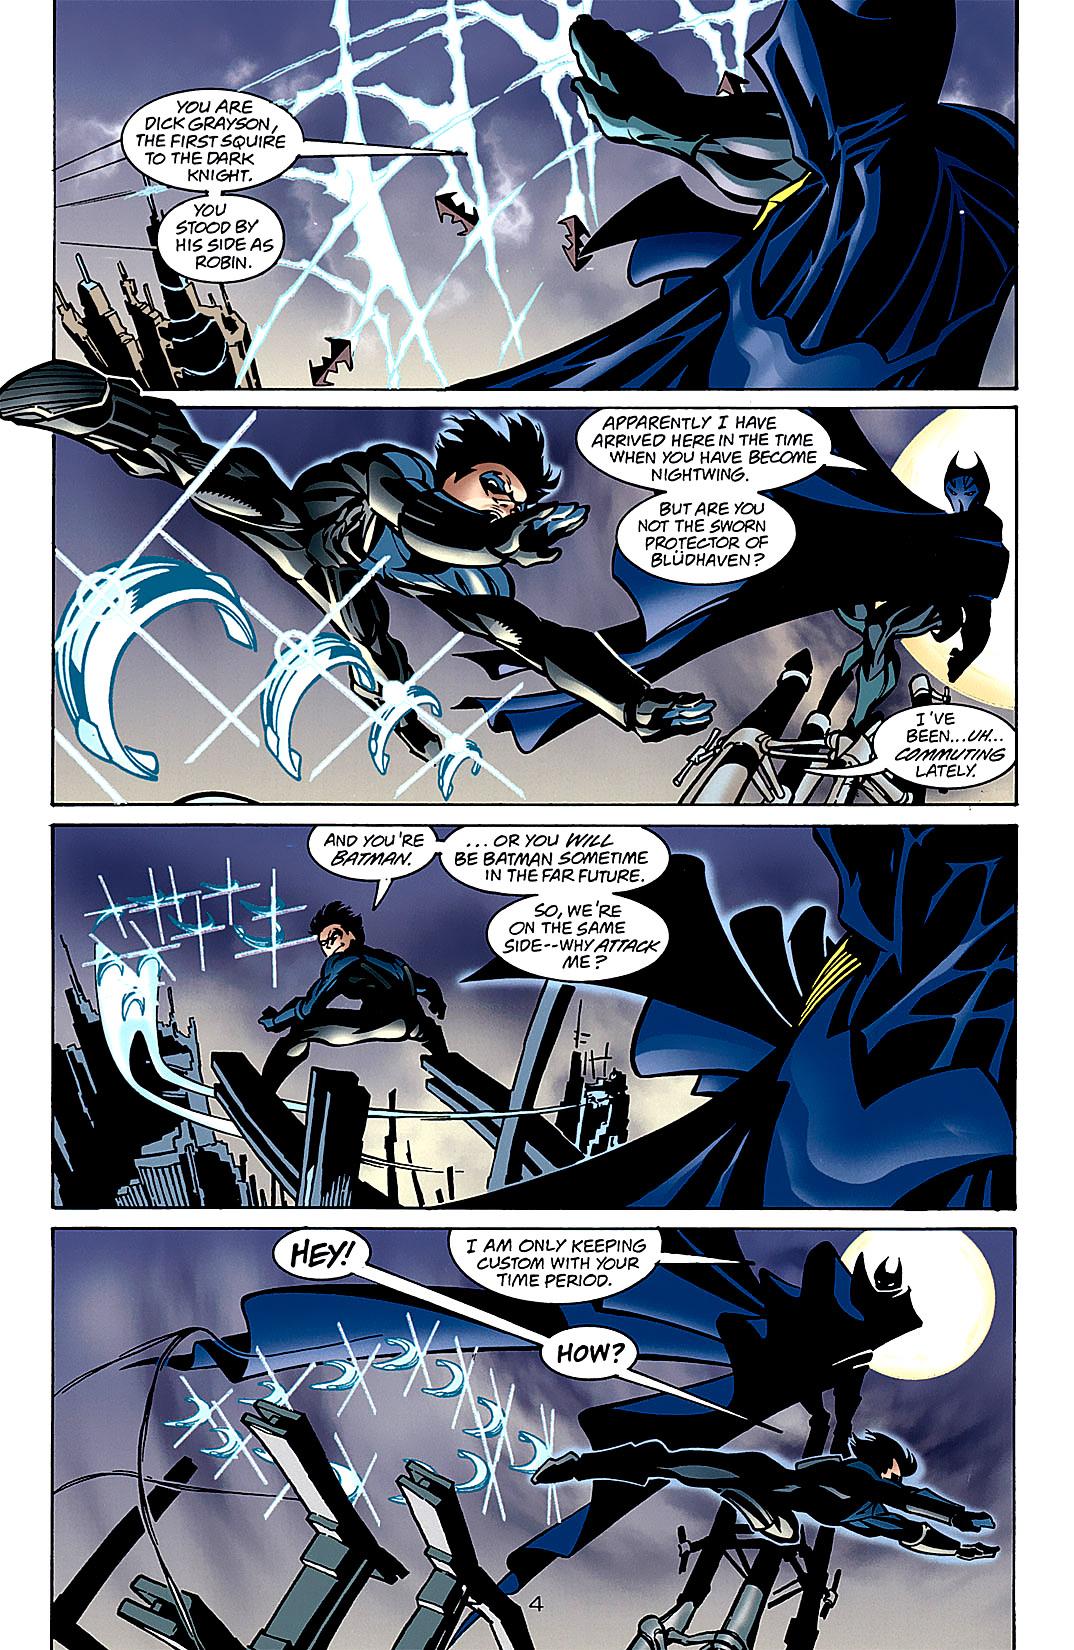 Nightwing (1996) chap 1000000 pic 5